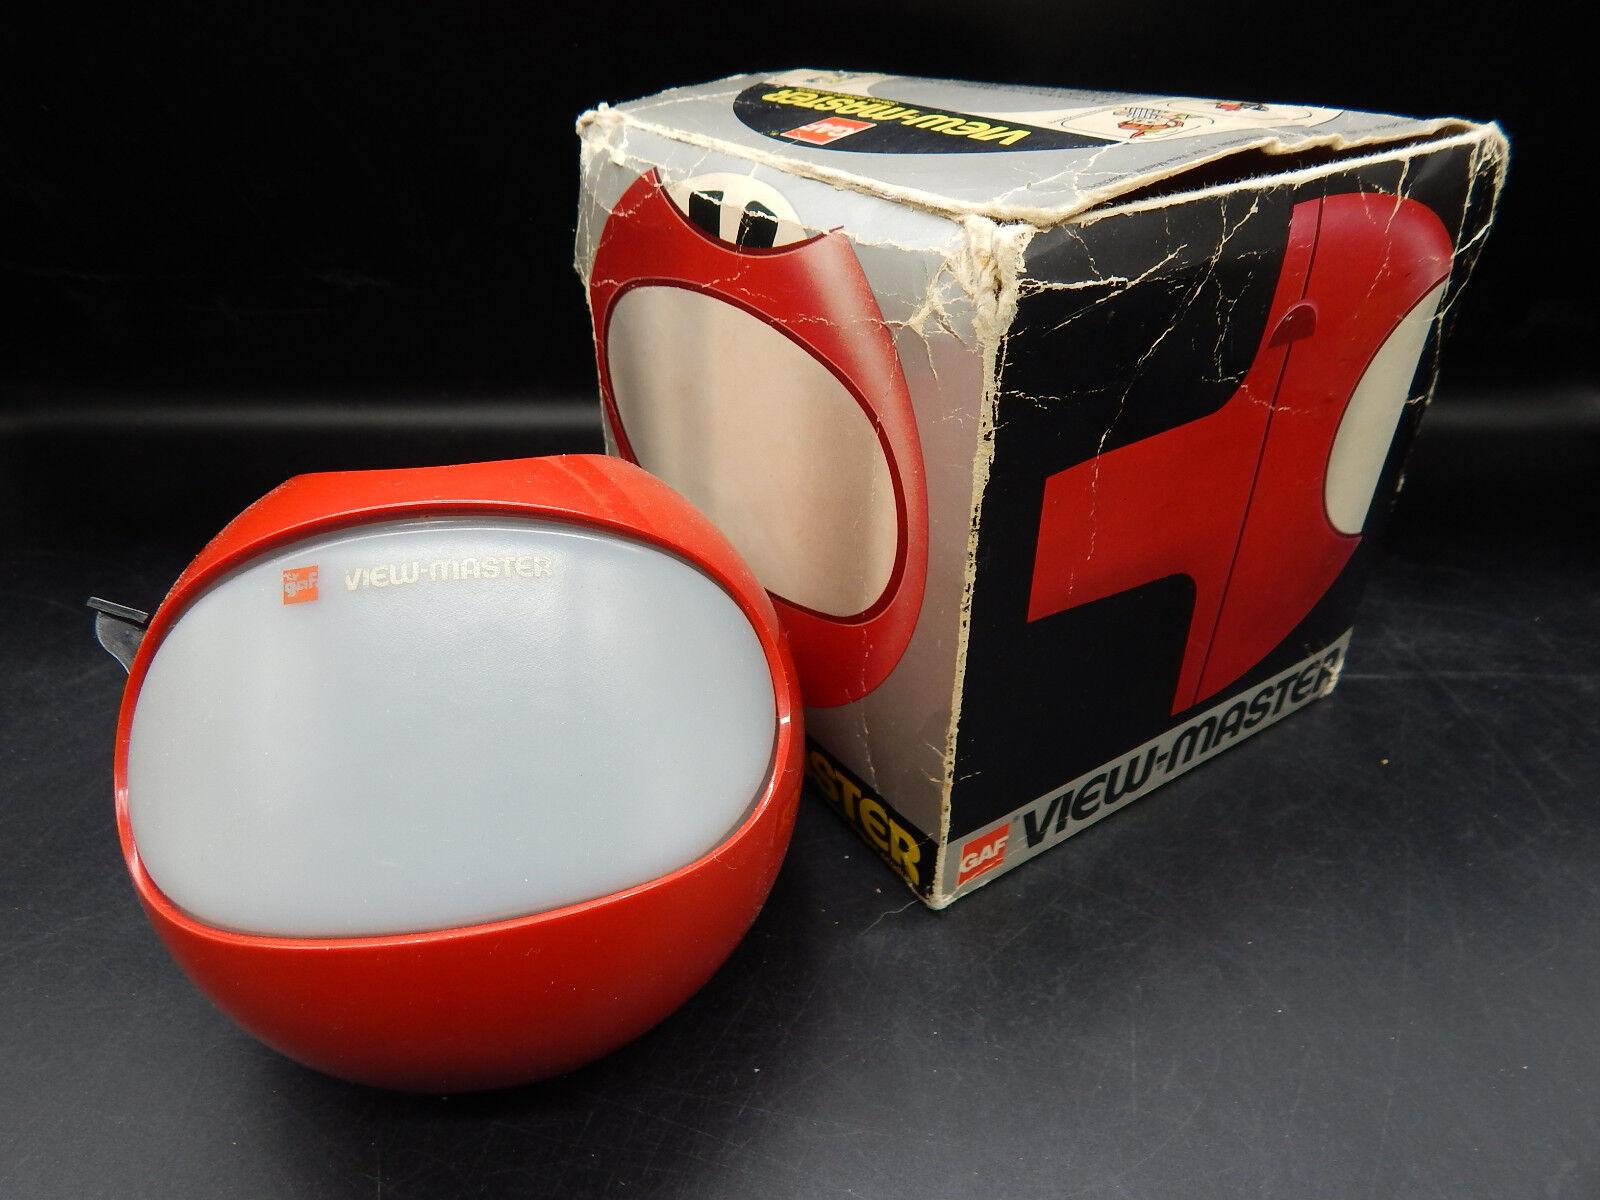 Vintage gaf view - master - modell k raum viewer belgien viewmaster w   original - box